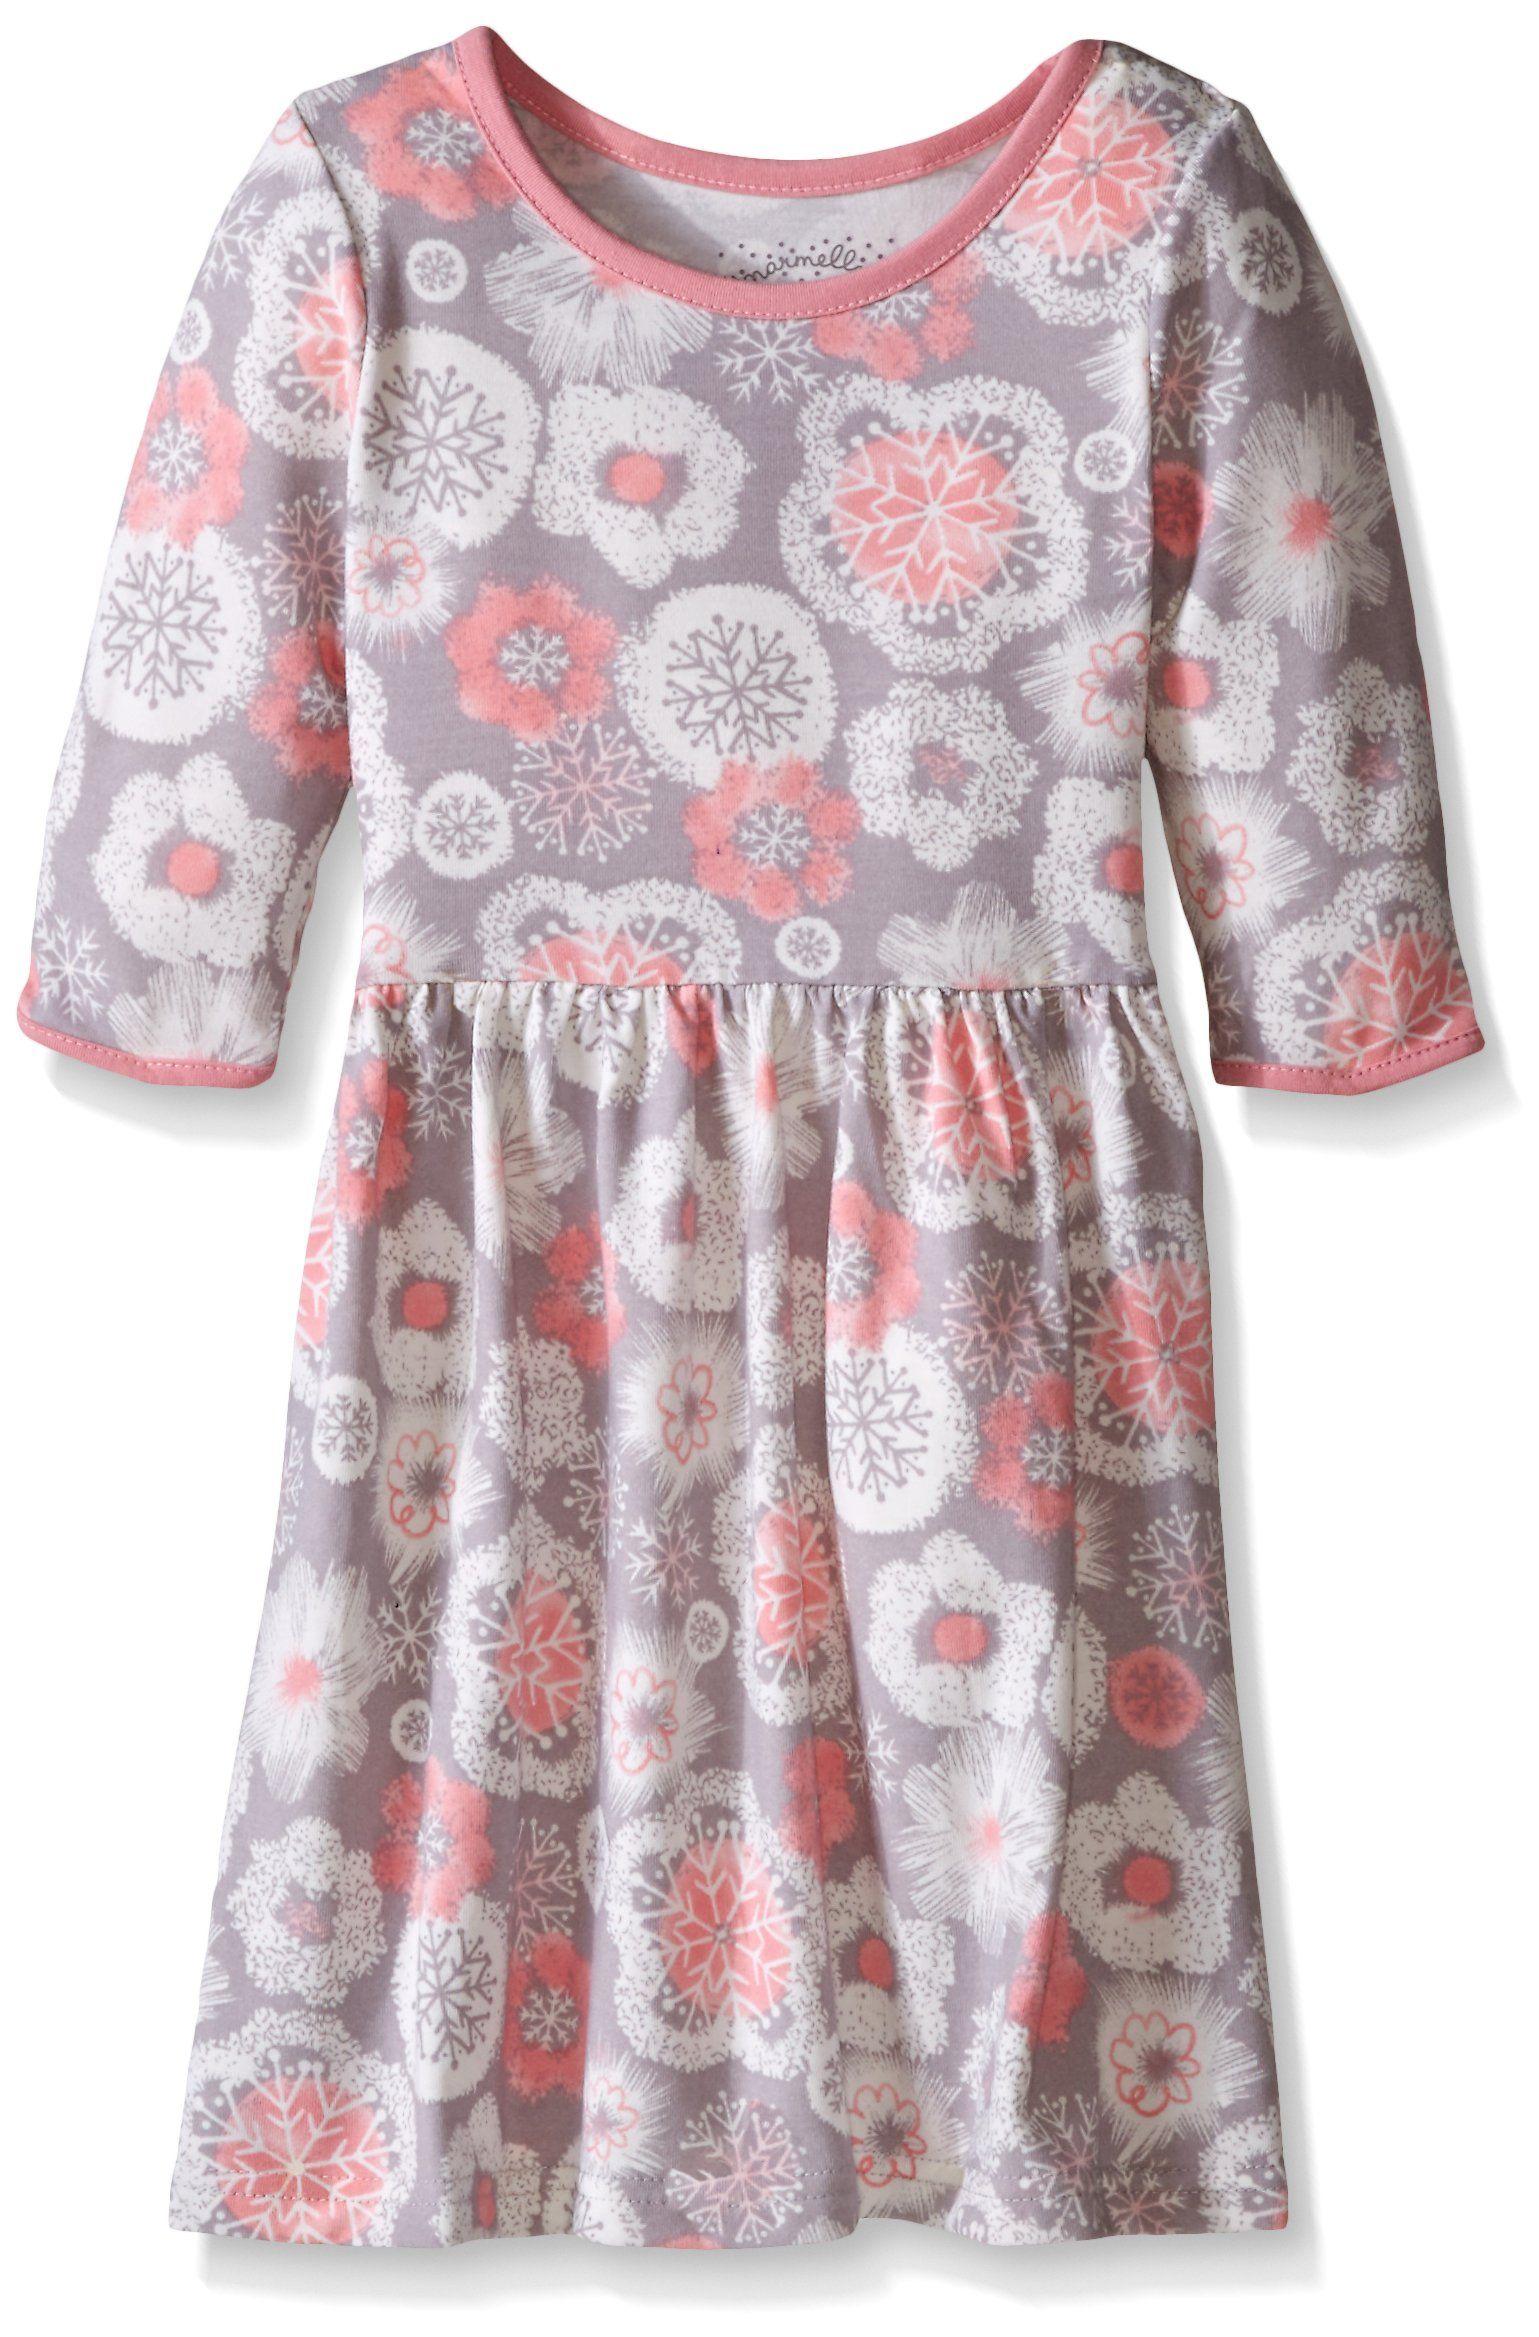 Marmellata Little Girls Toddler Snowflake Knit Dress Multi 2T